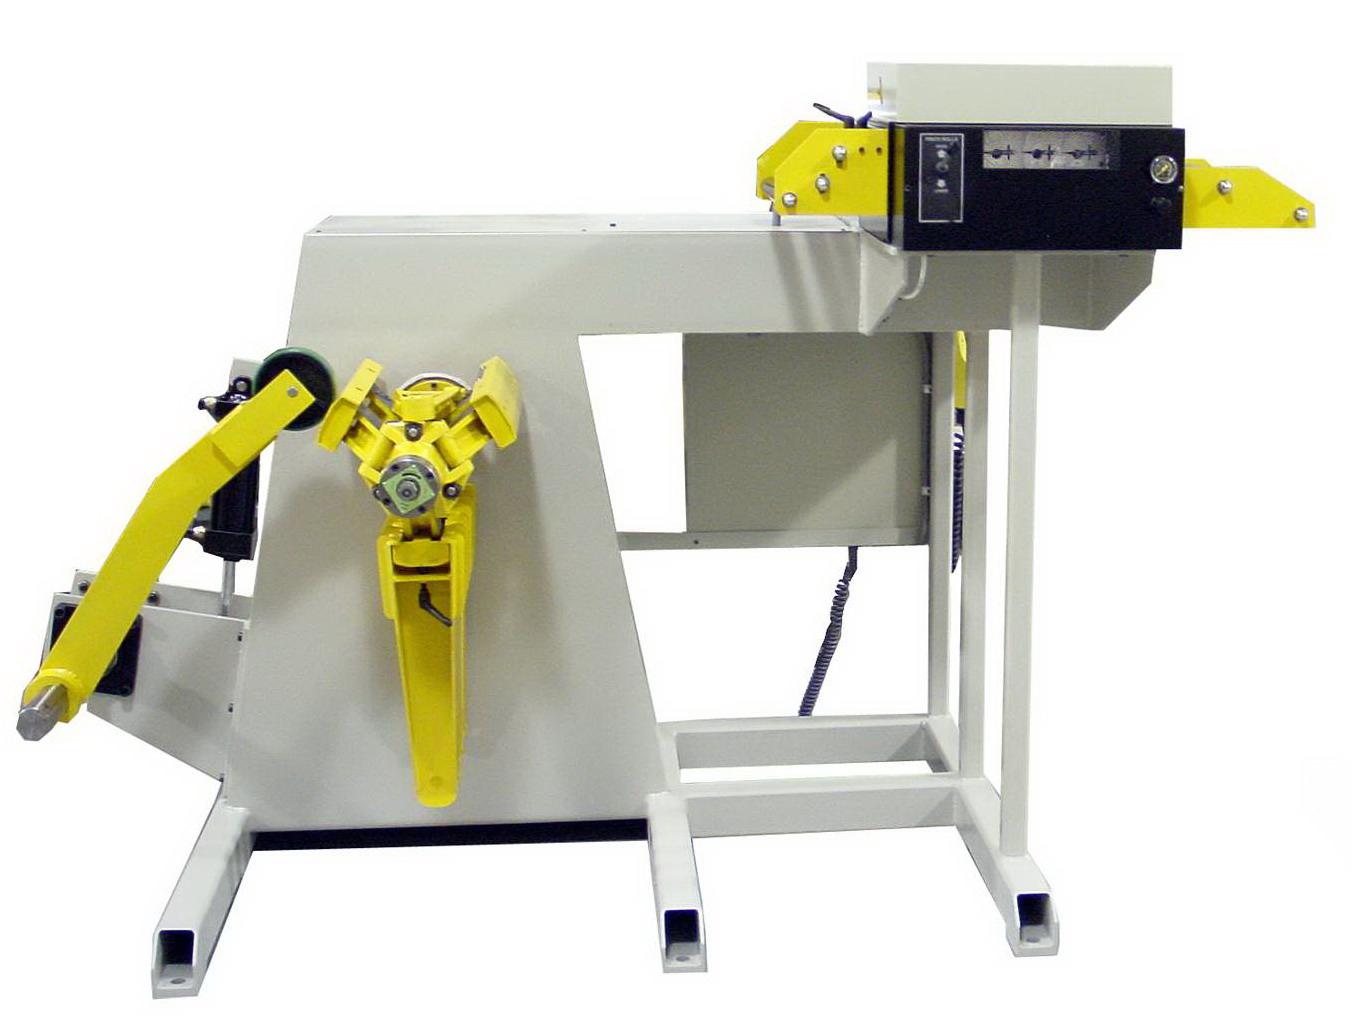 haspel-kombimaschine-3in1(2)